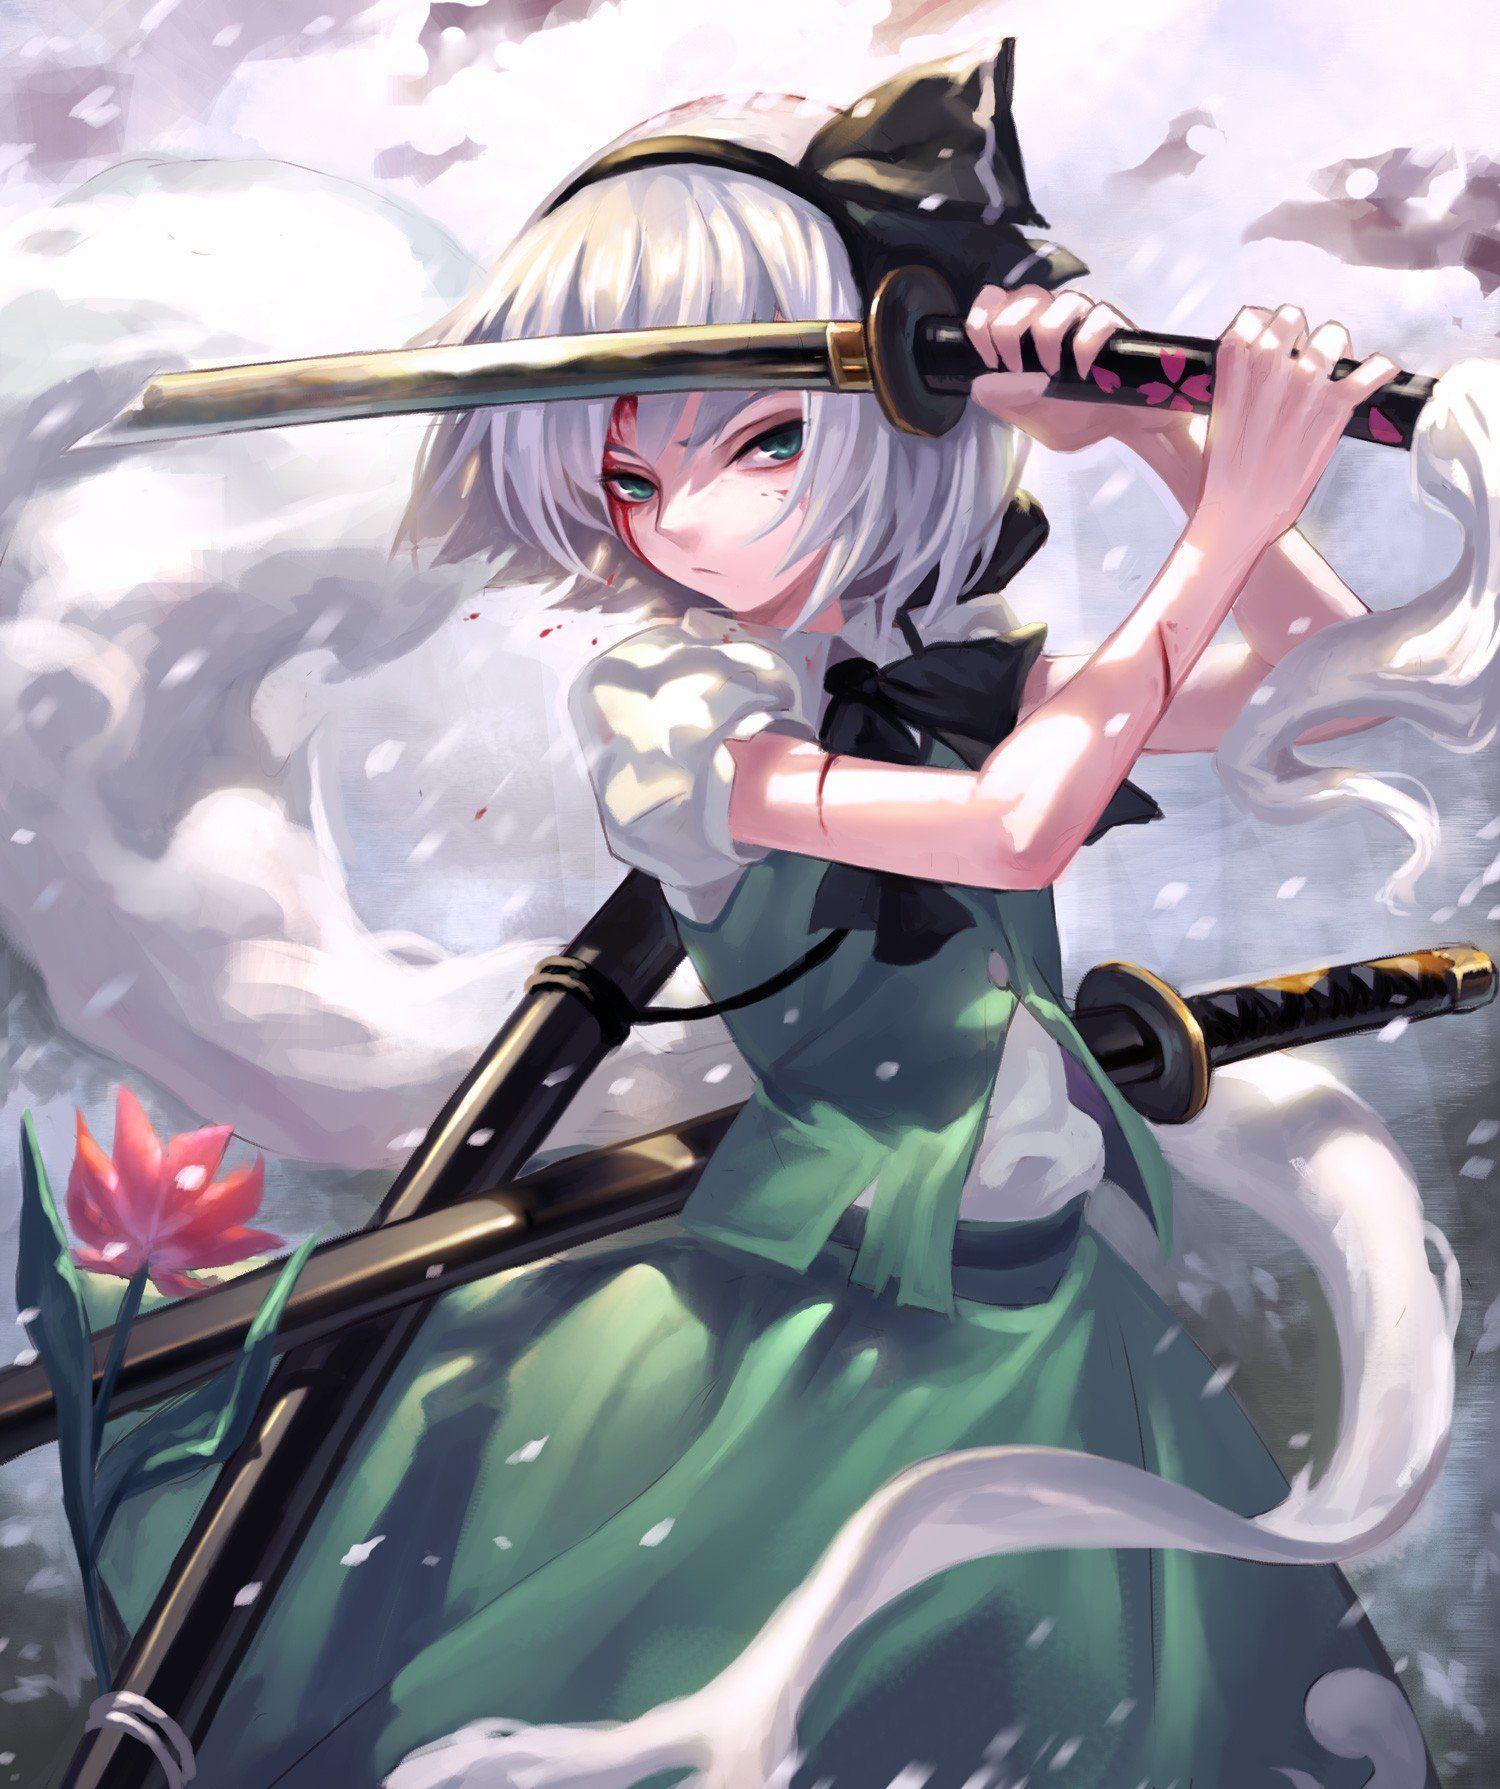 short hair Green eyes Anime Anime girls Gray hair Sword Weapon